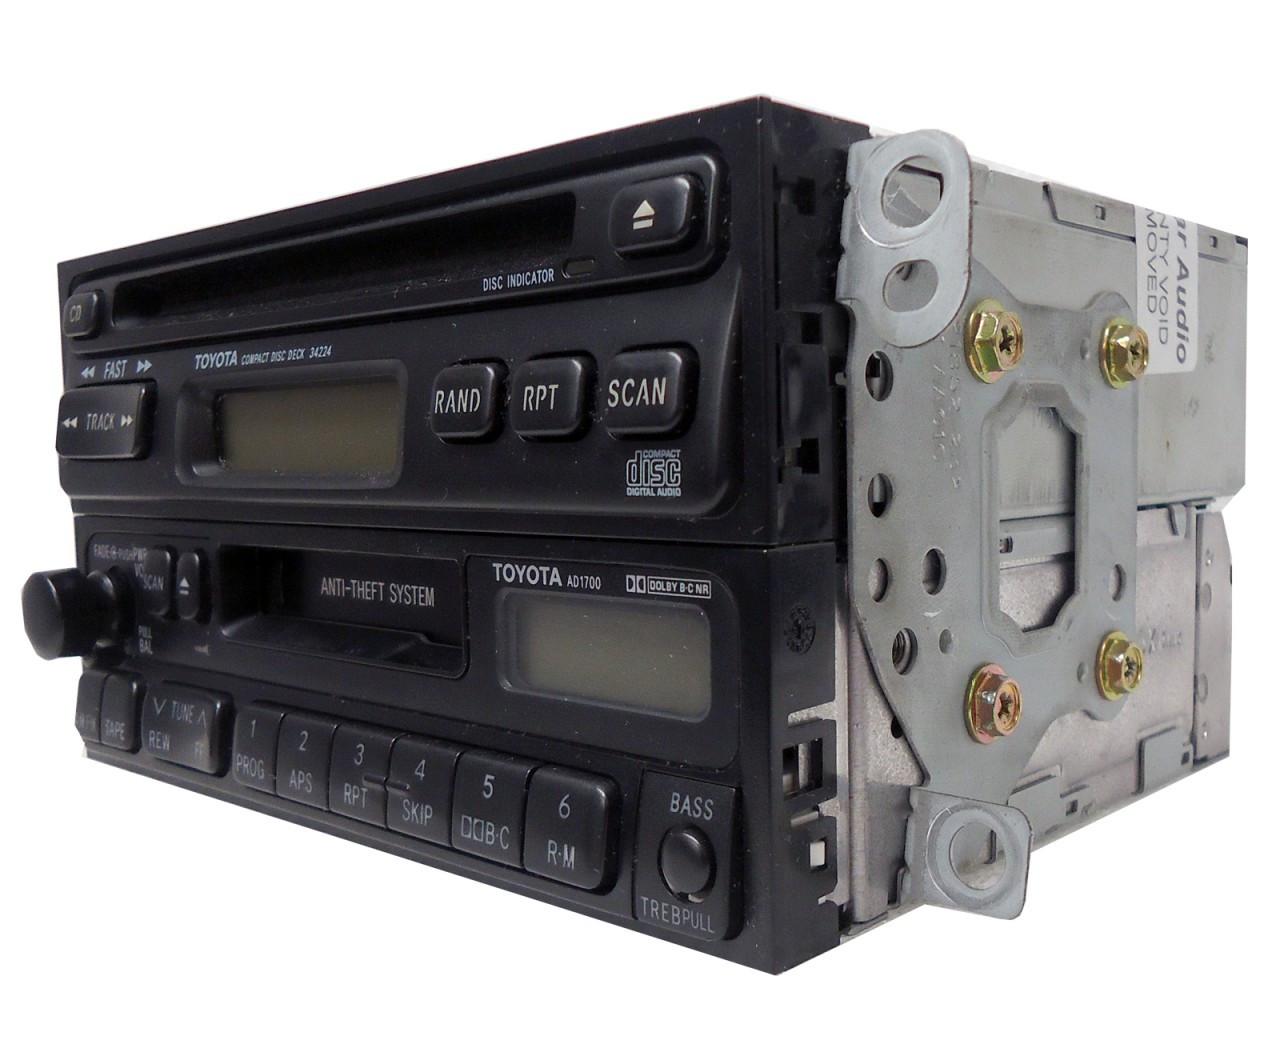 90 91 92 93 94 95 96 97 98 99 toyota celica 4runner camry radio tape  [ 1280 x 1040 Pixel ]